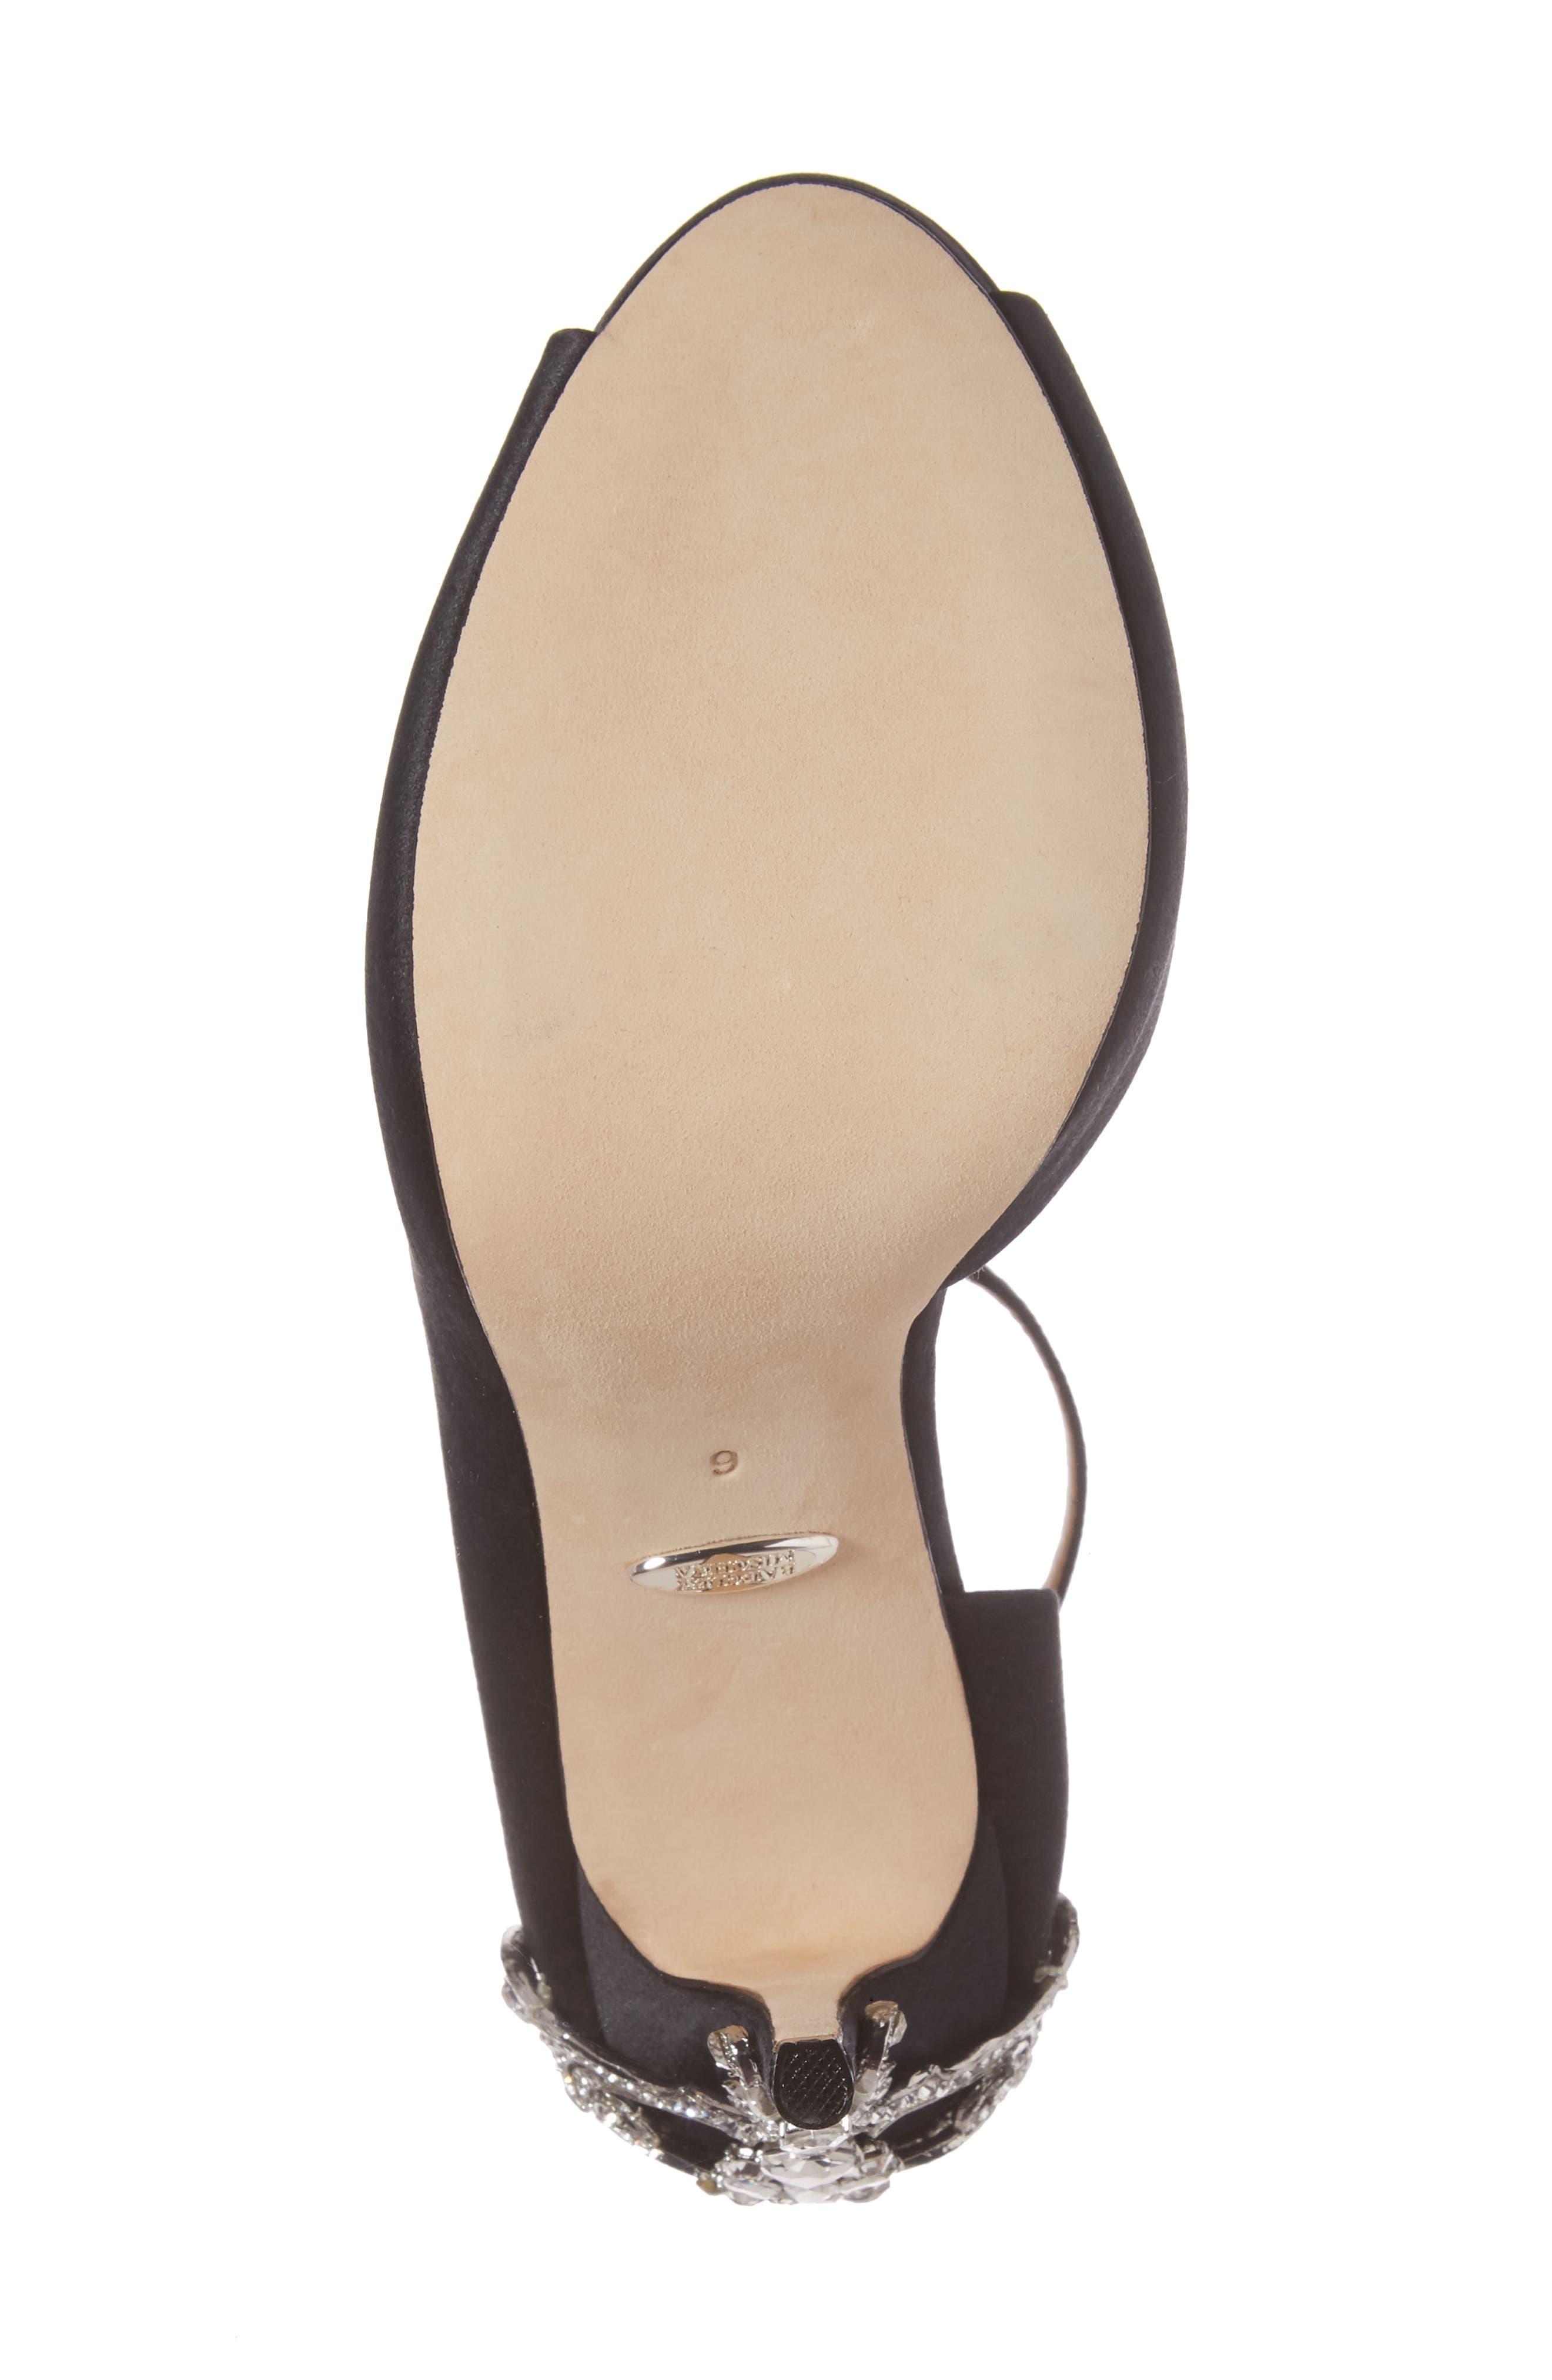 Badgley Micshka Karson Embellished Peep Toe Pump,                             Alternate thumbnail 6, color,                             015